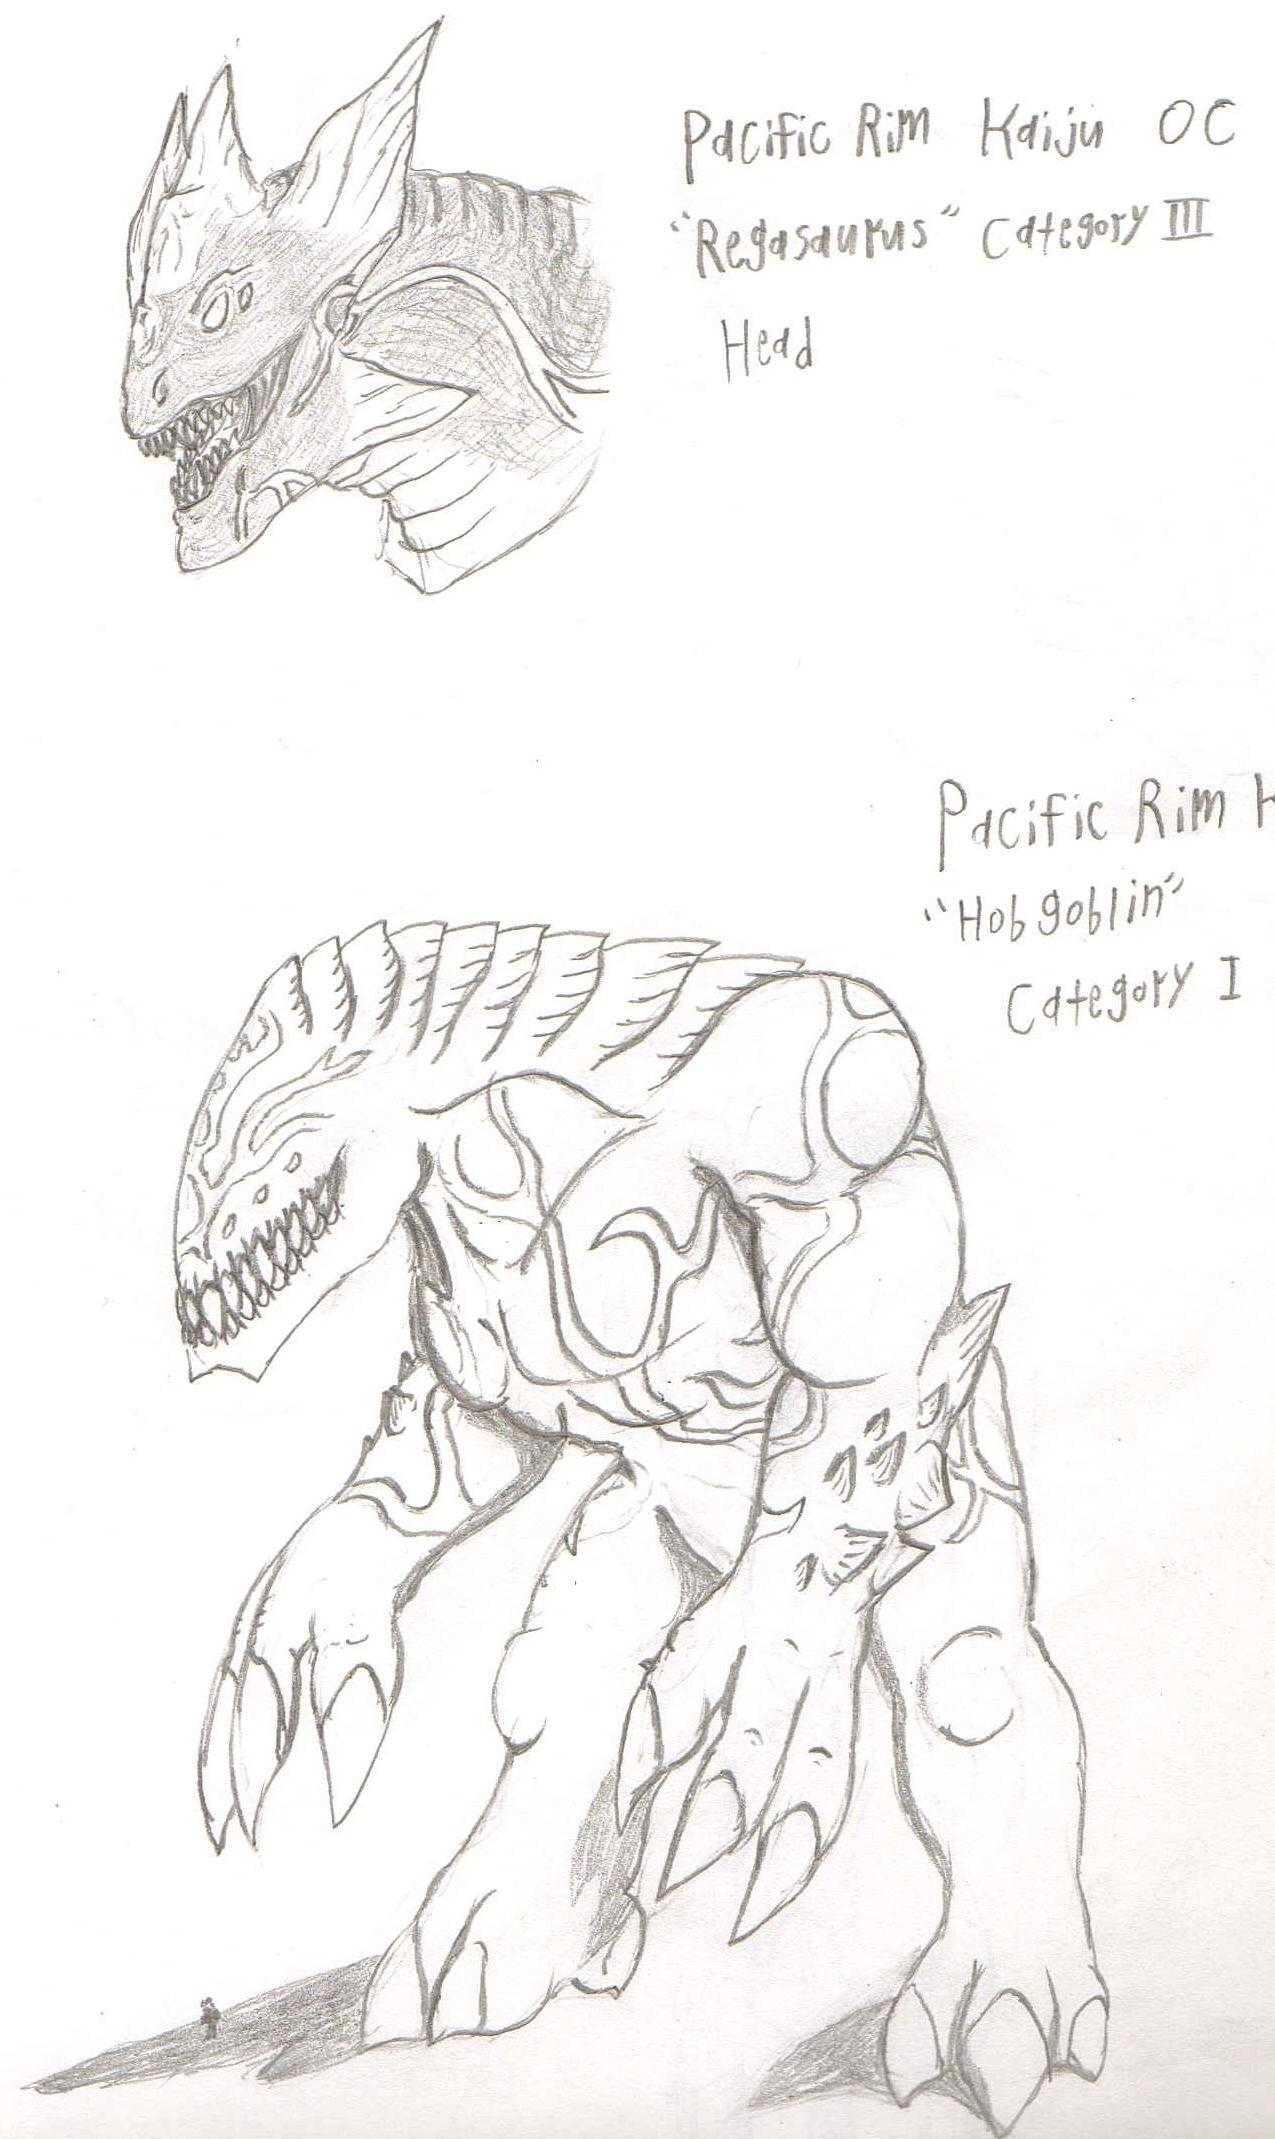 AdventDestiny's Kaiju Fan-Art Gallery Pacific_rim_oc_kaiju_regasaurus_and_hobgoblin_by_adventdestiny-d6etug6